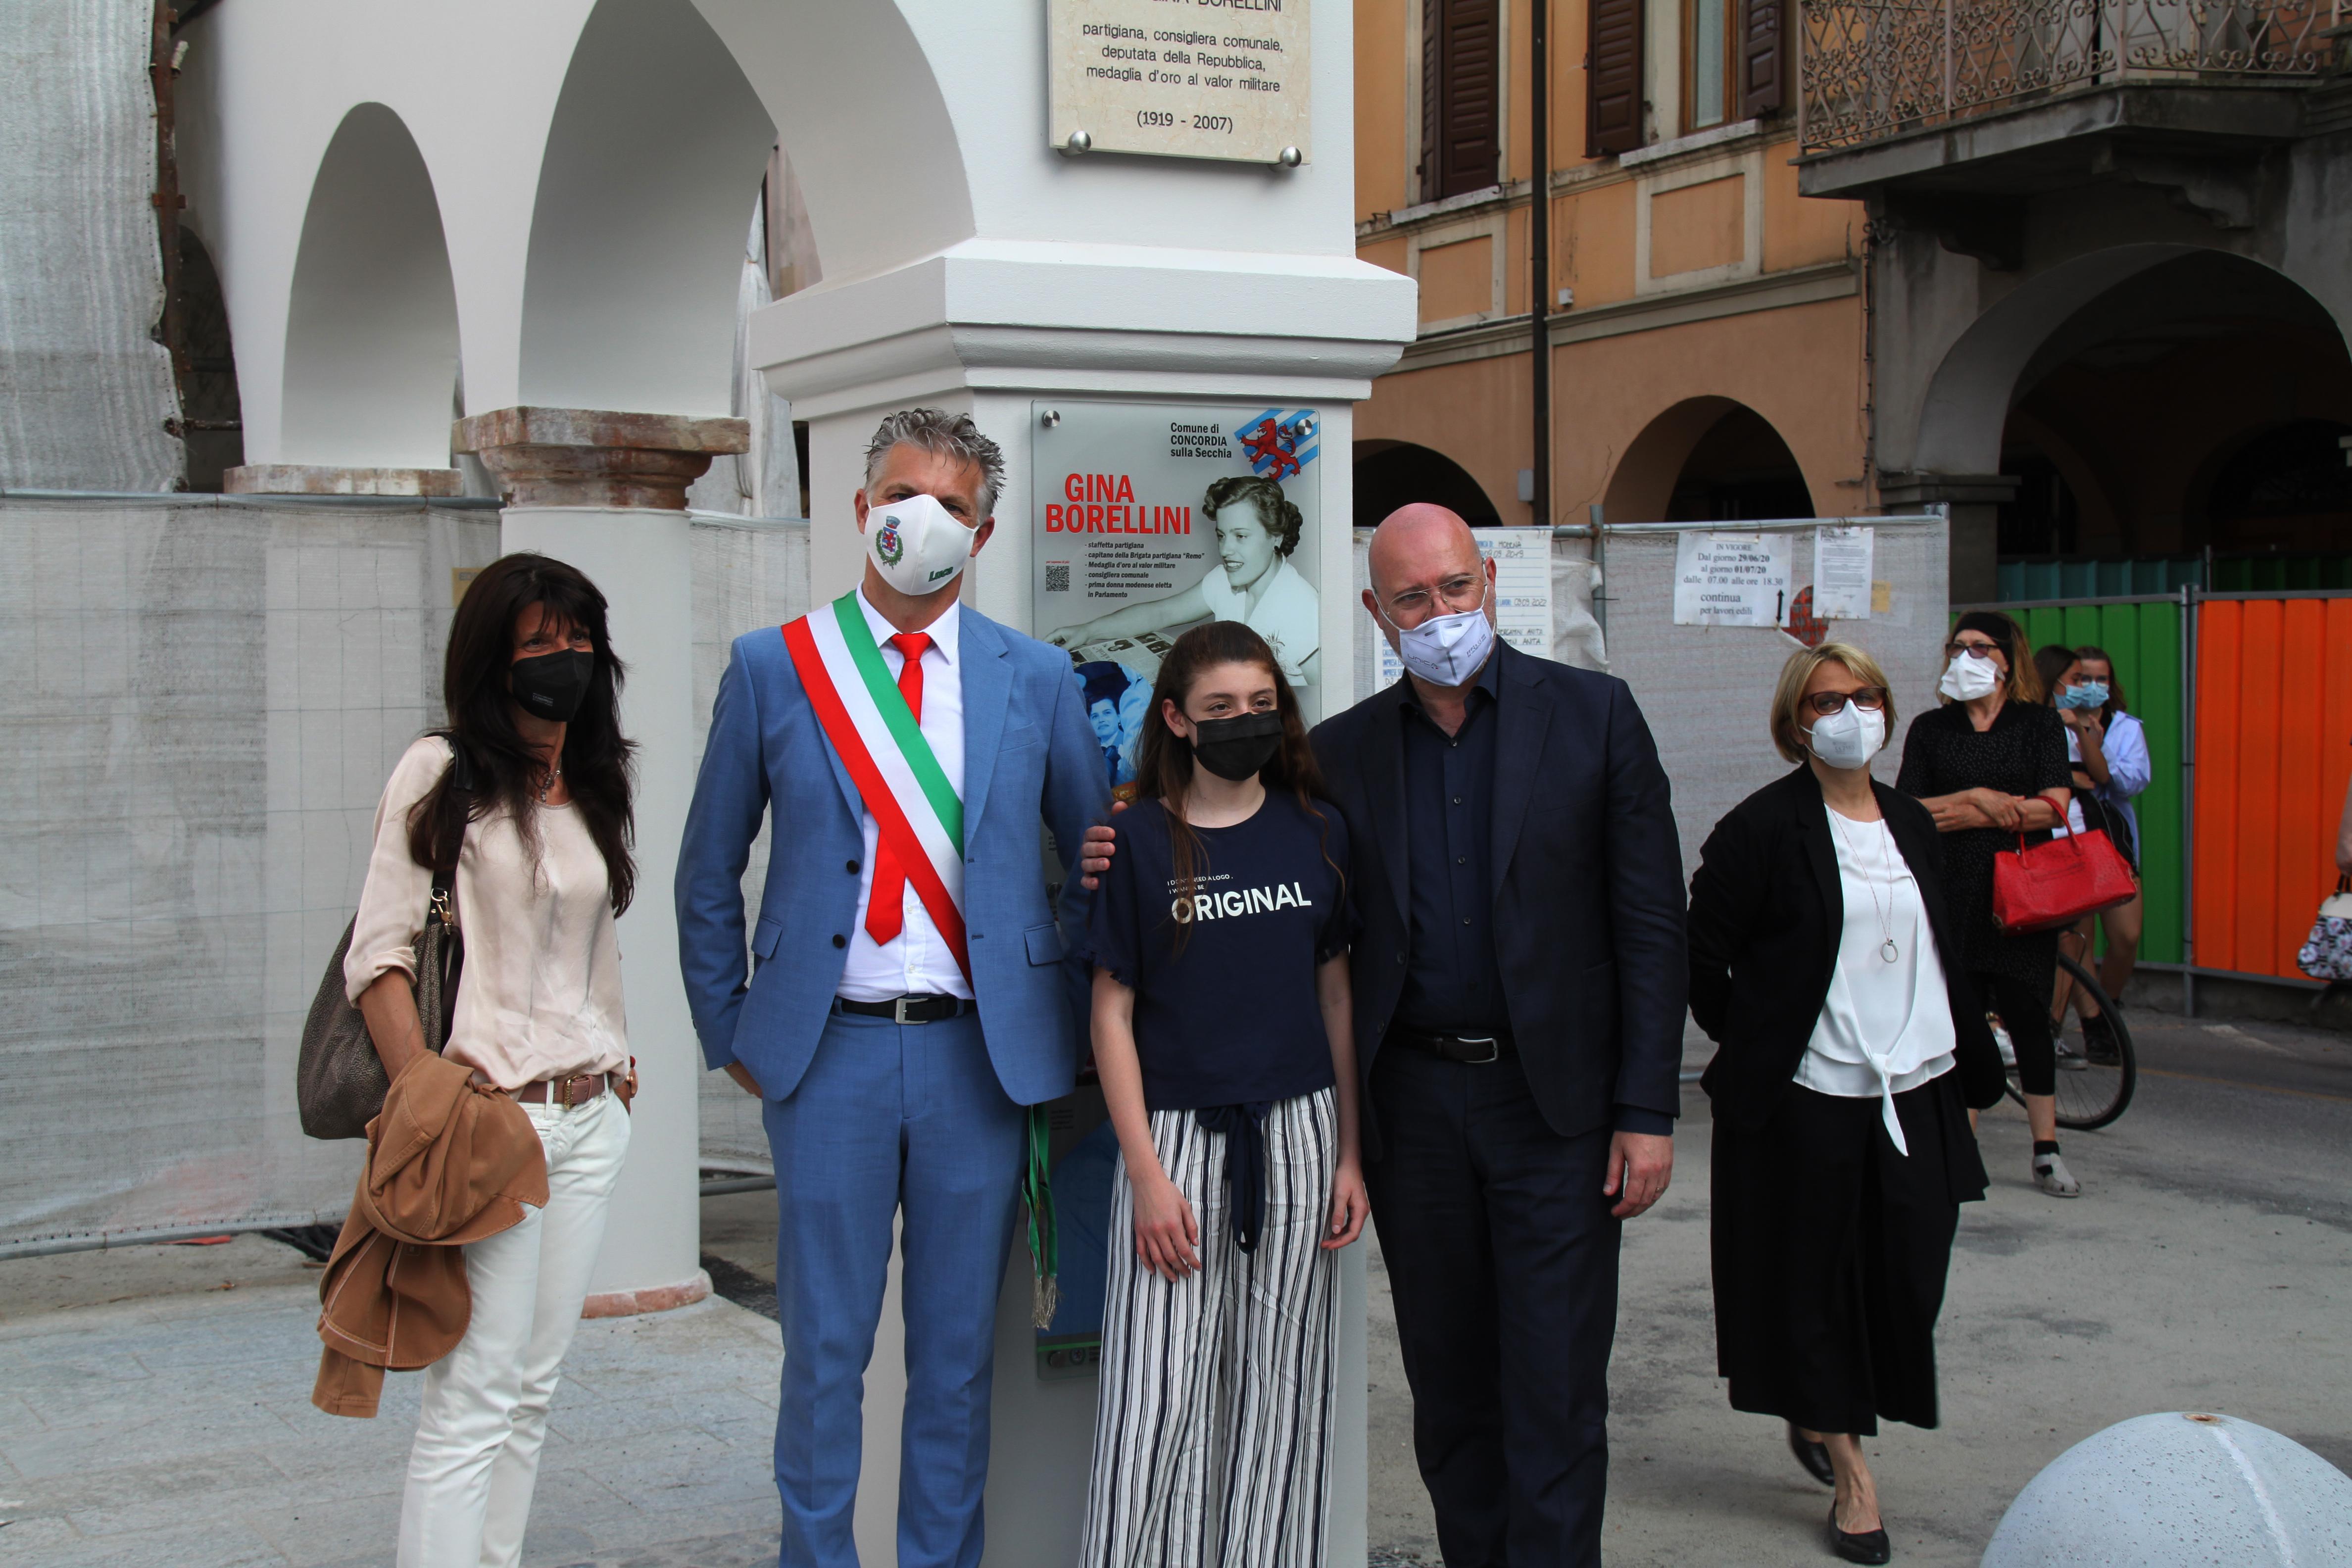 Forme-dacqua_Fontana-nuova-piazza-Gina-Borellini-5